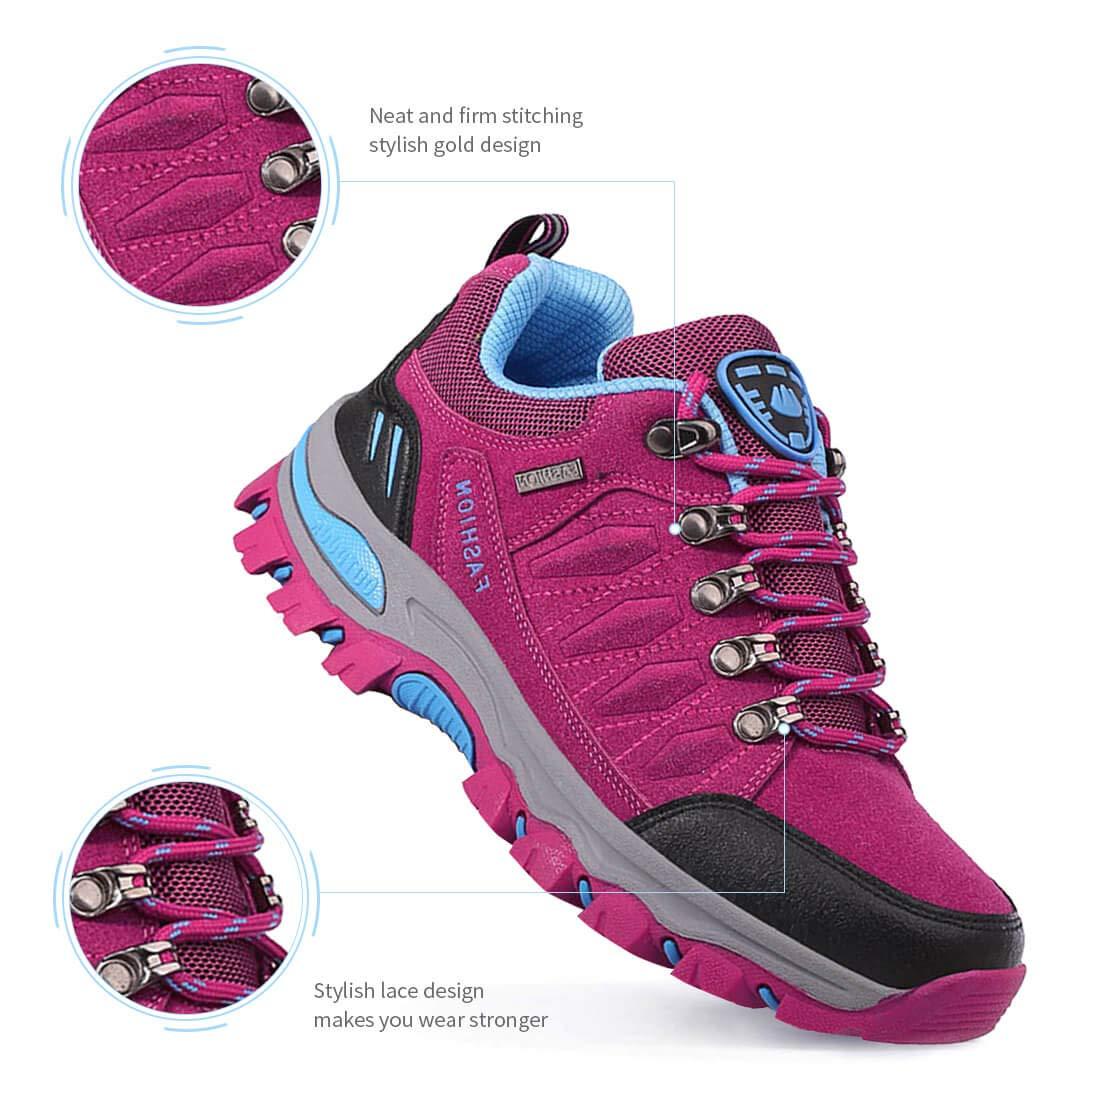 LSGEGO Unisex Wanderschuhe Outdoor Wanderschuhe Casual Reisen Wandern Klettern Stiefel Unisex Atmungsaktive wasserdichte Paare Schuhe